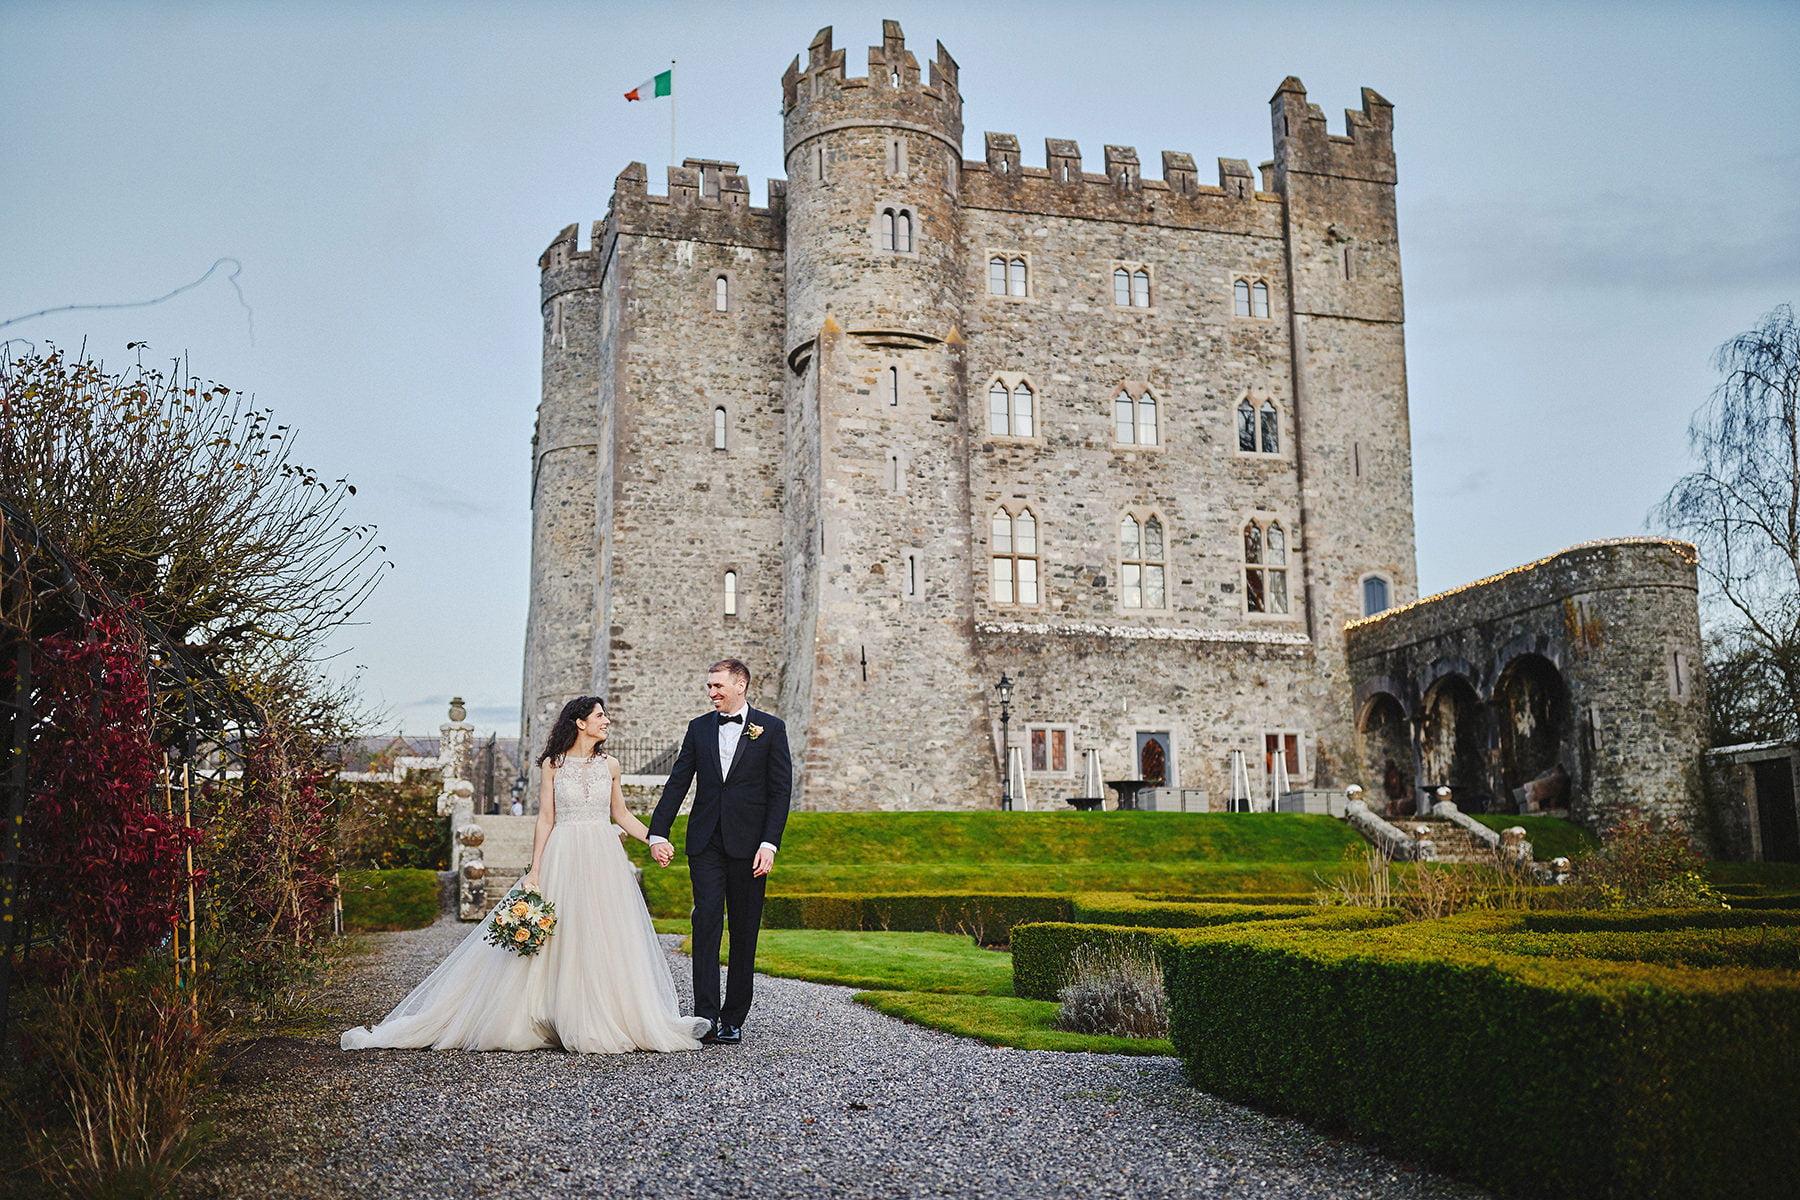 Kilkea Castle – The perfect Fairytale Wedding Venue 1